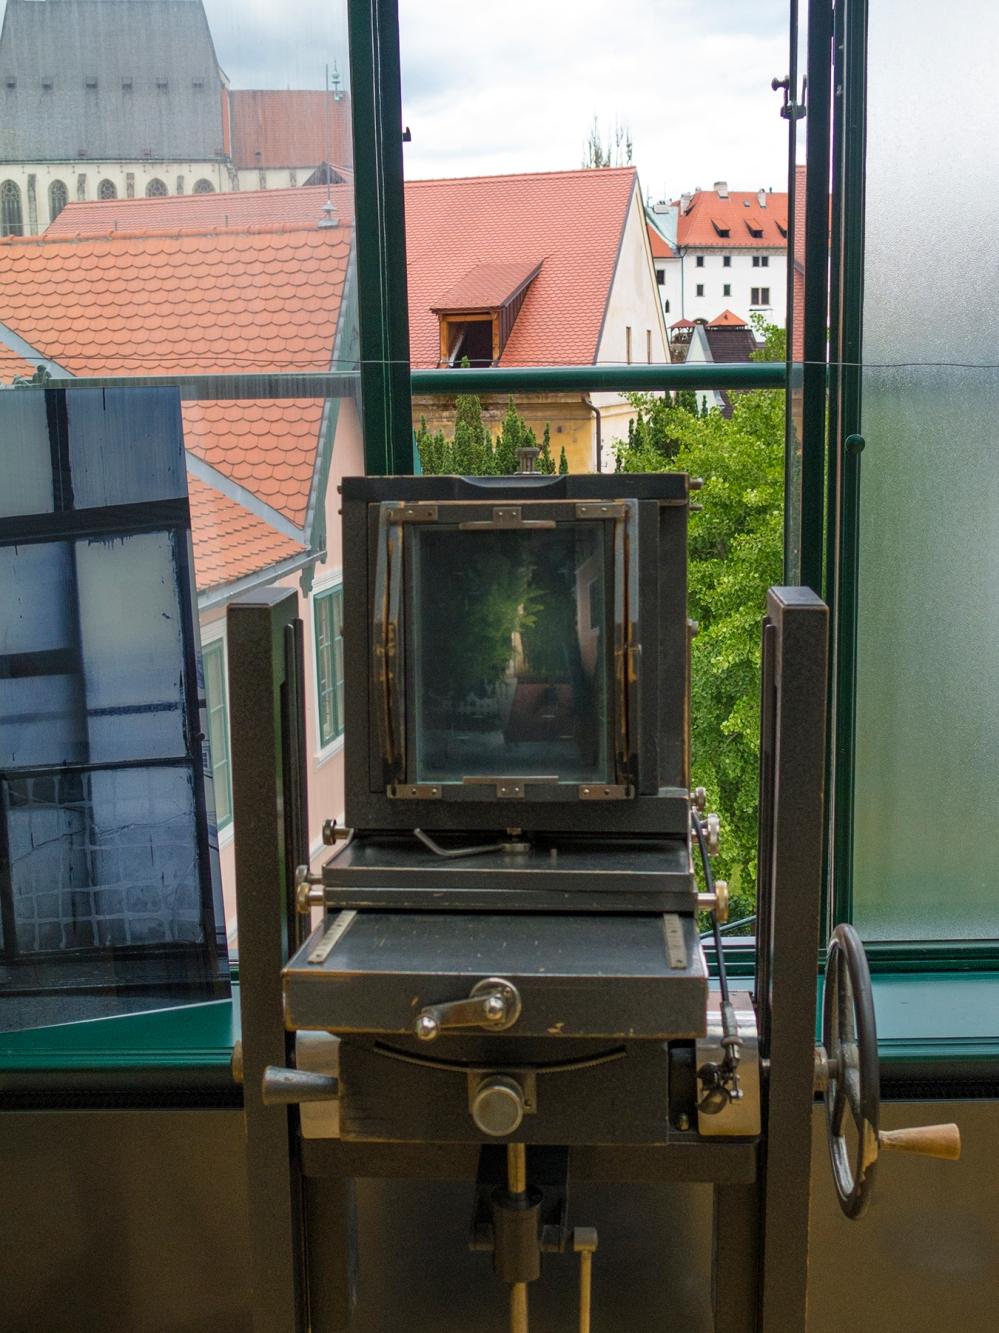 Josef Seidel view, Cesky Krumlov